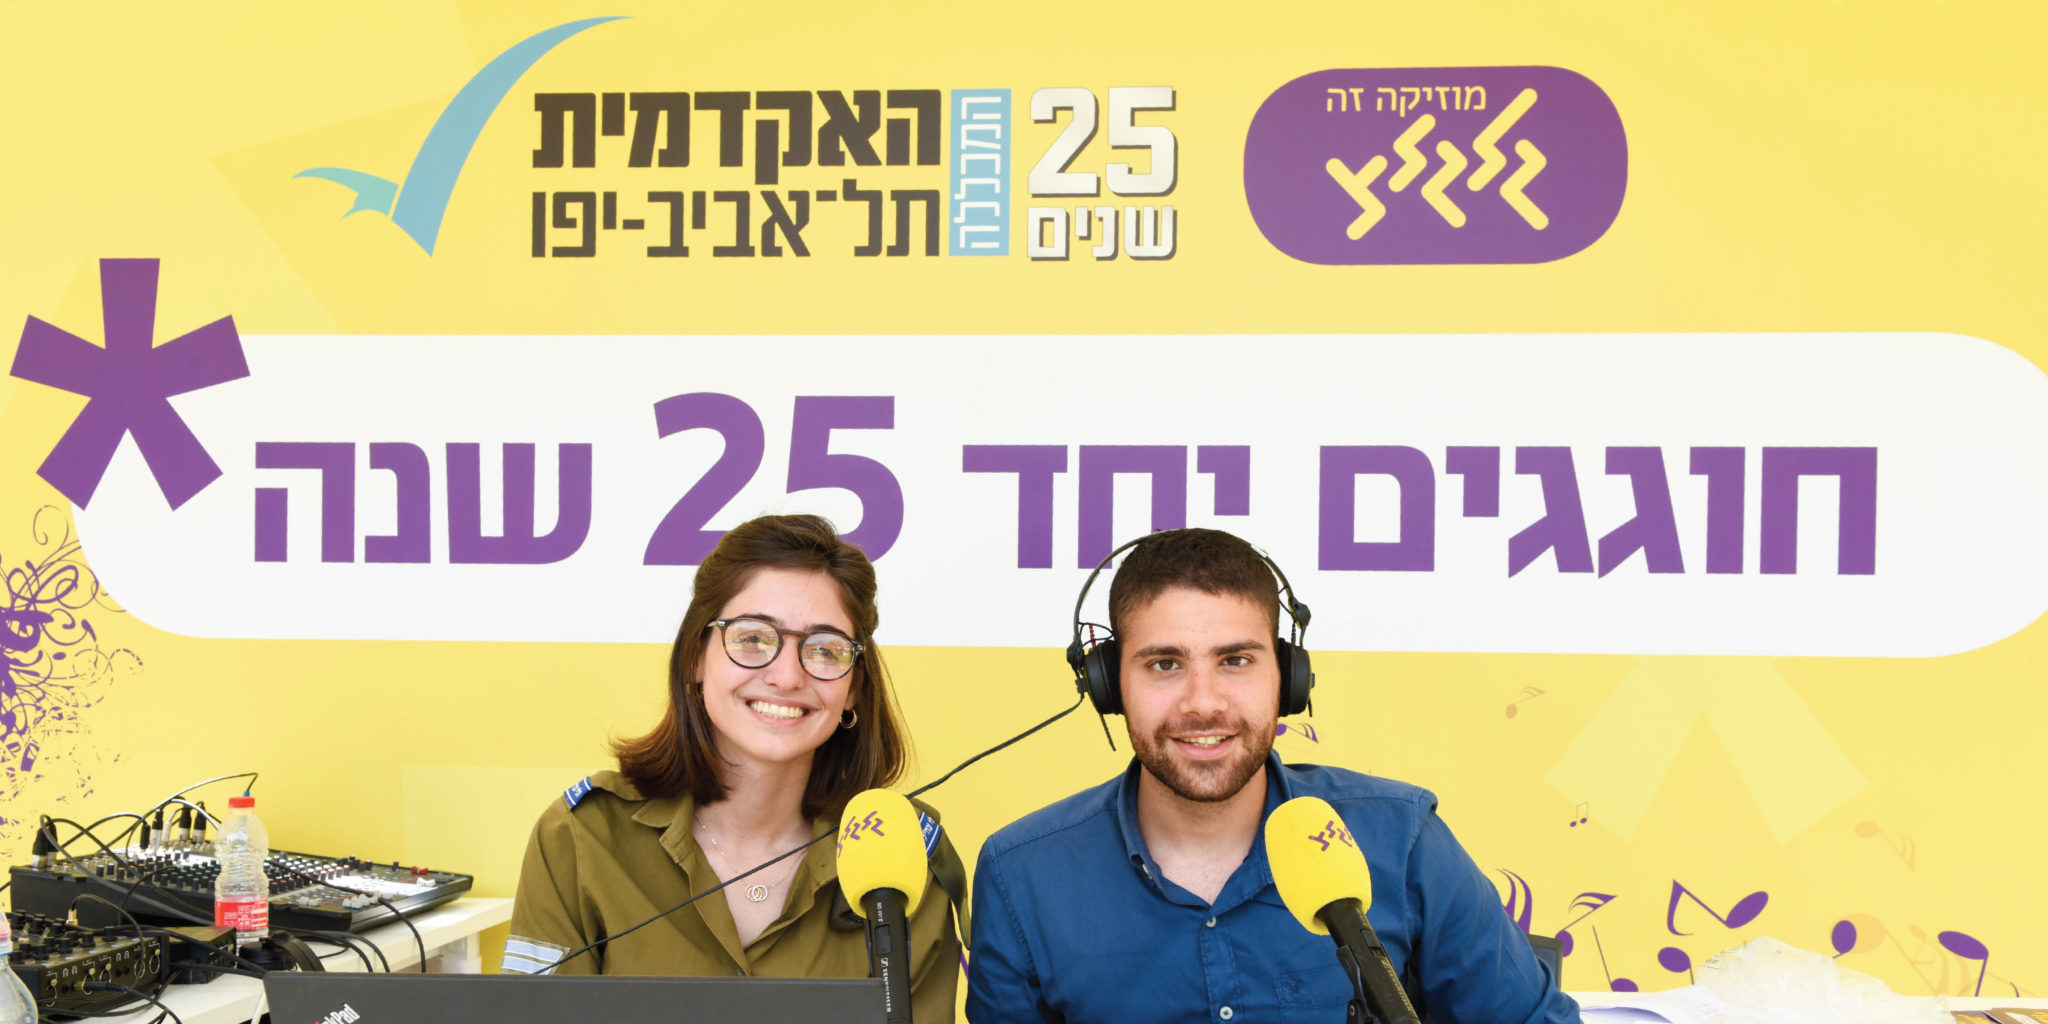 The Academic College of Tel Aviv-Yaffo